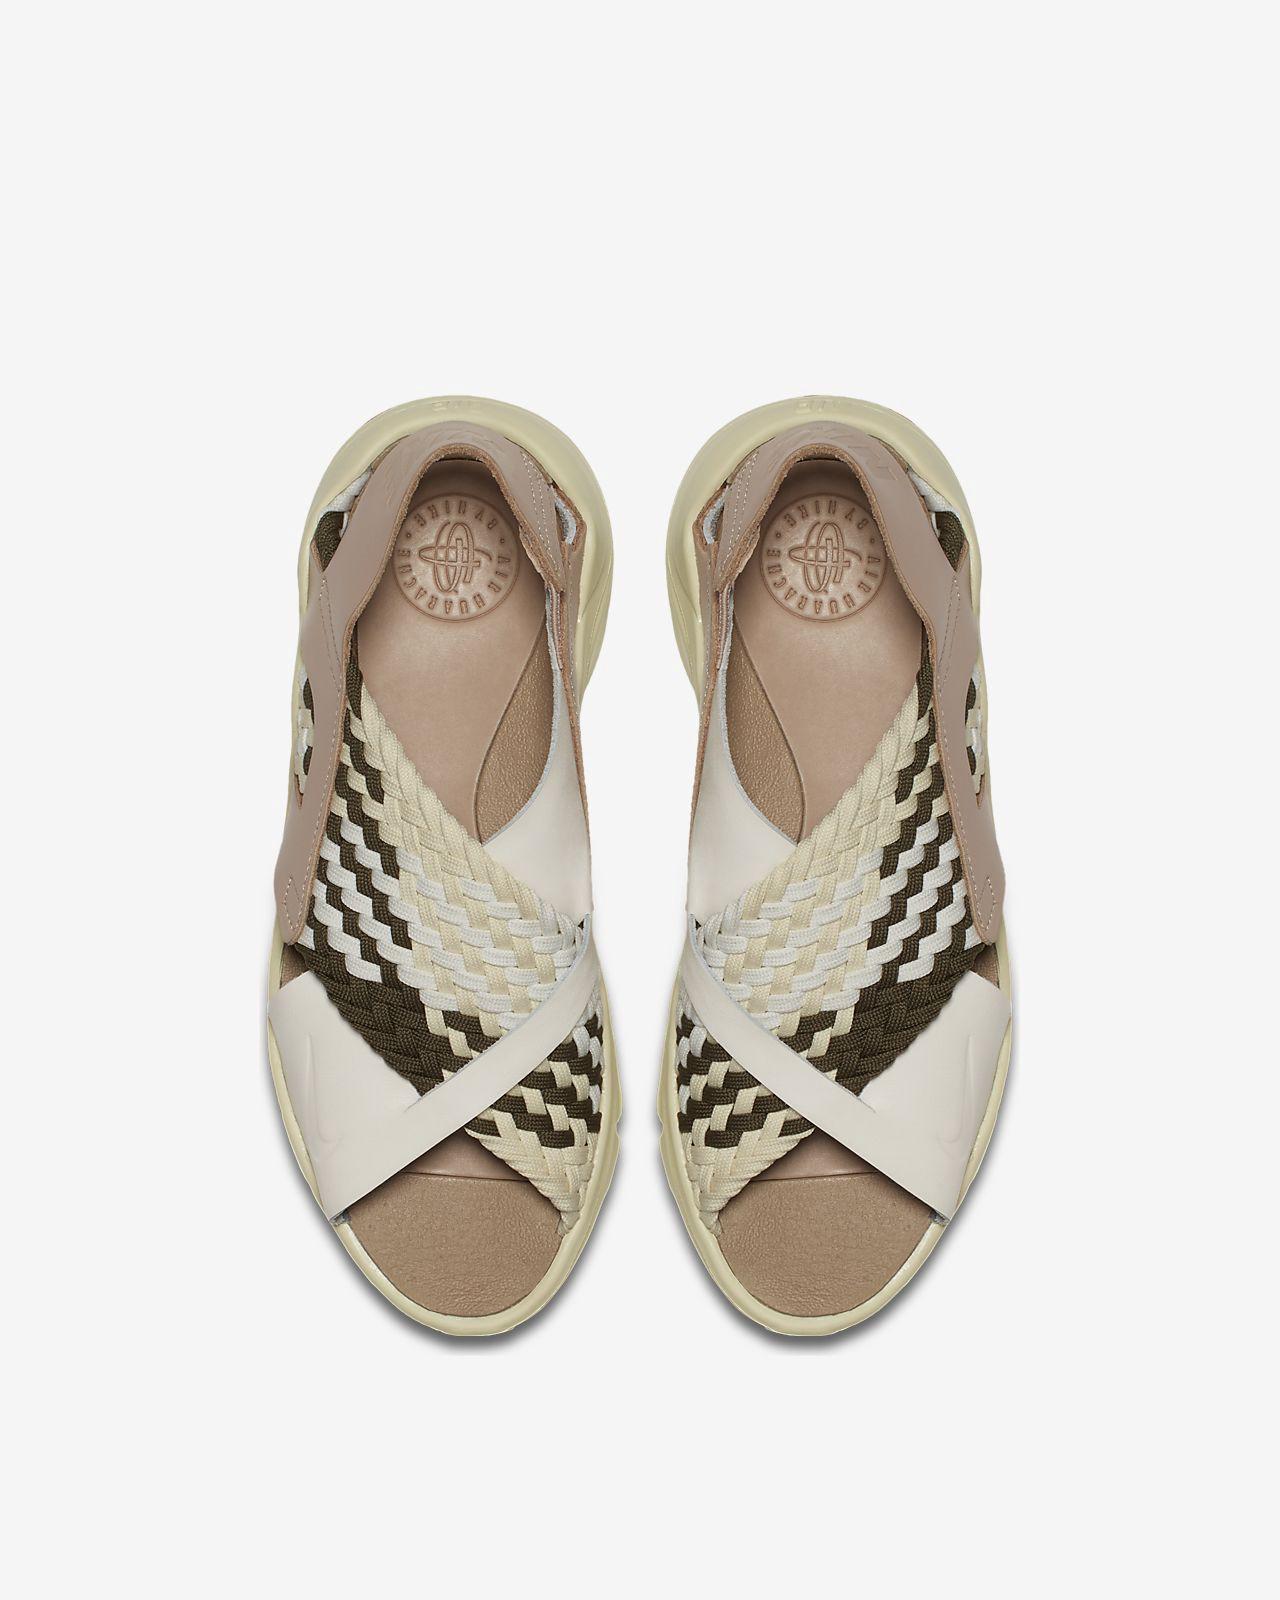 9aff2ec667f4 Nike Air Huarache Ultra Women s Sandal - 5